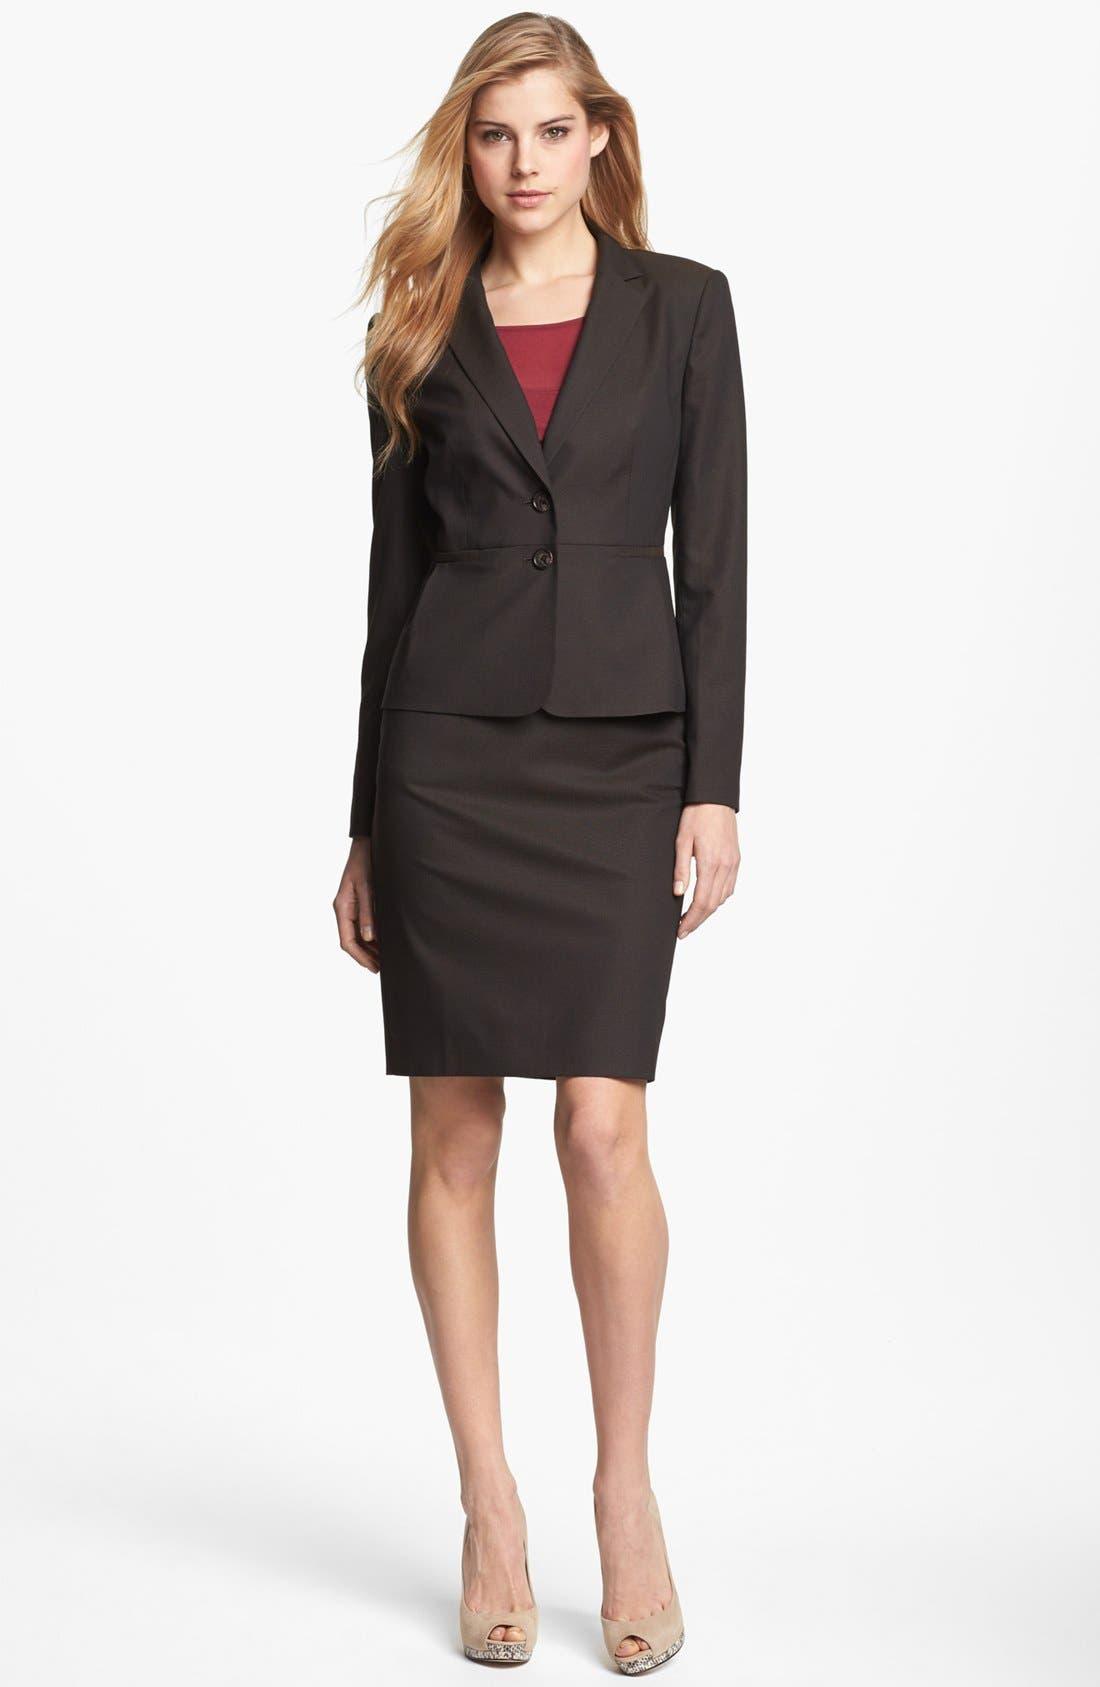 Alternate Image 1 Selected - Halogen® Suit Jacket, Top & Pencil Skirt